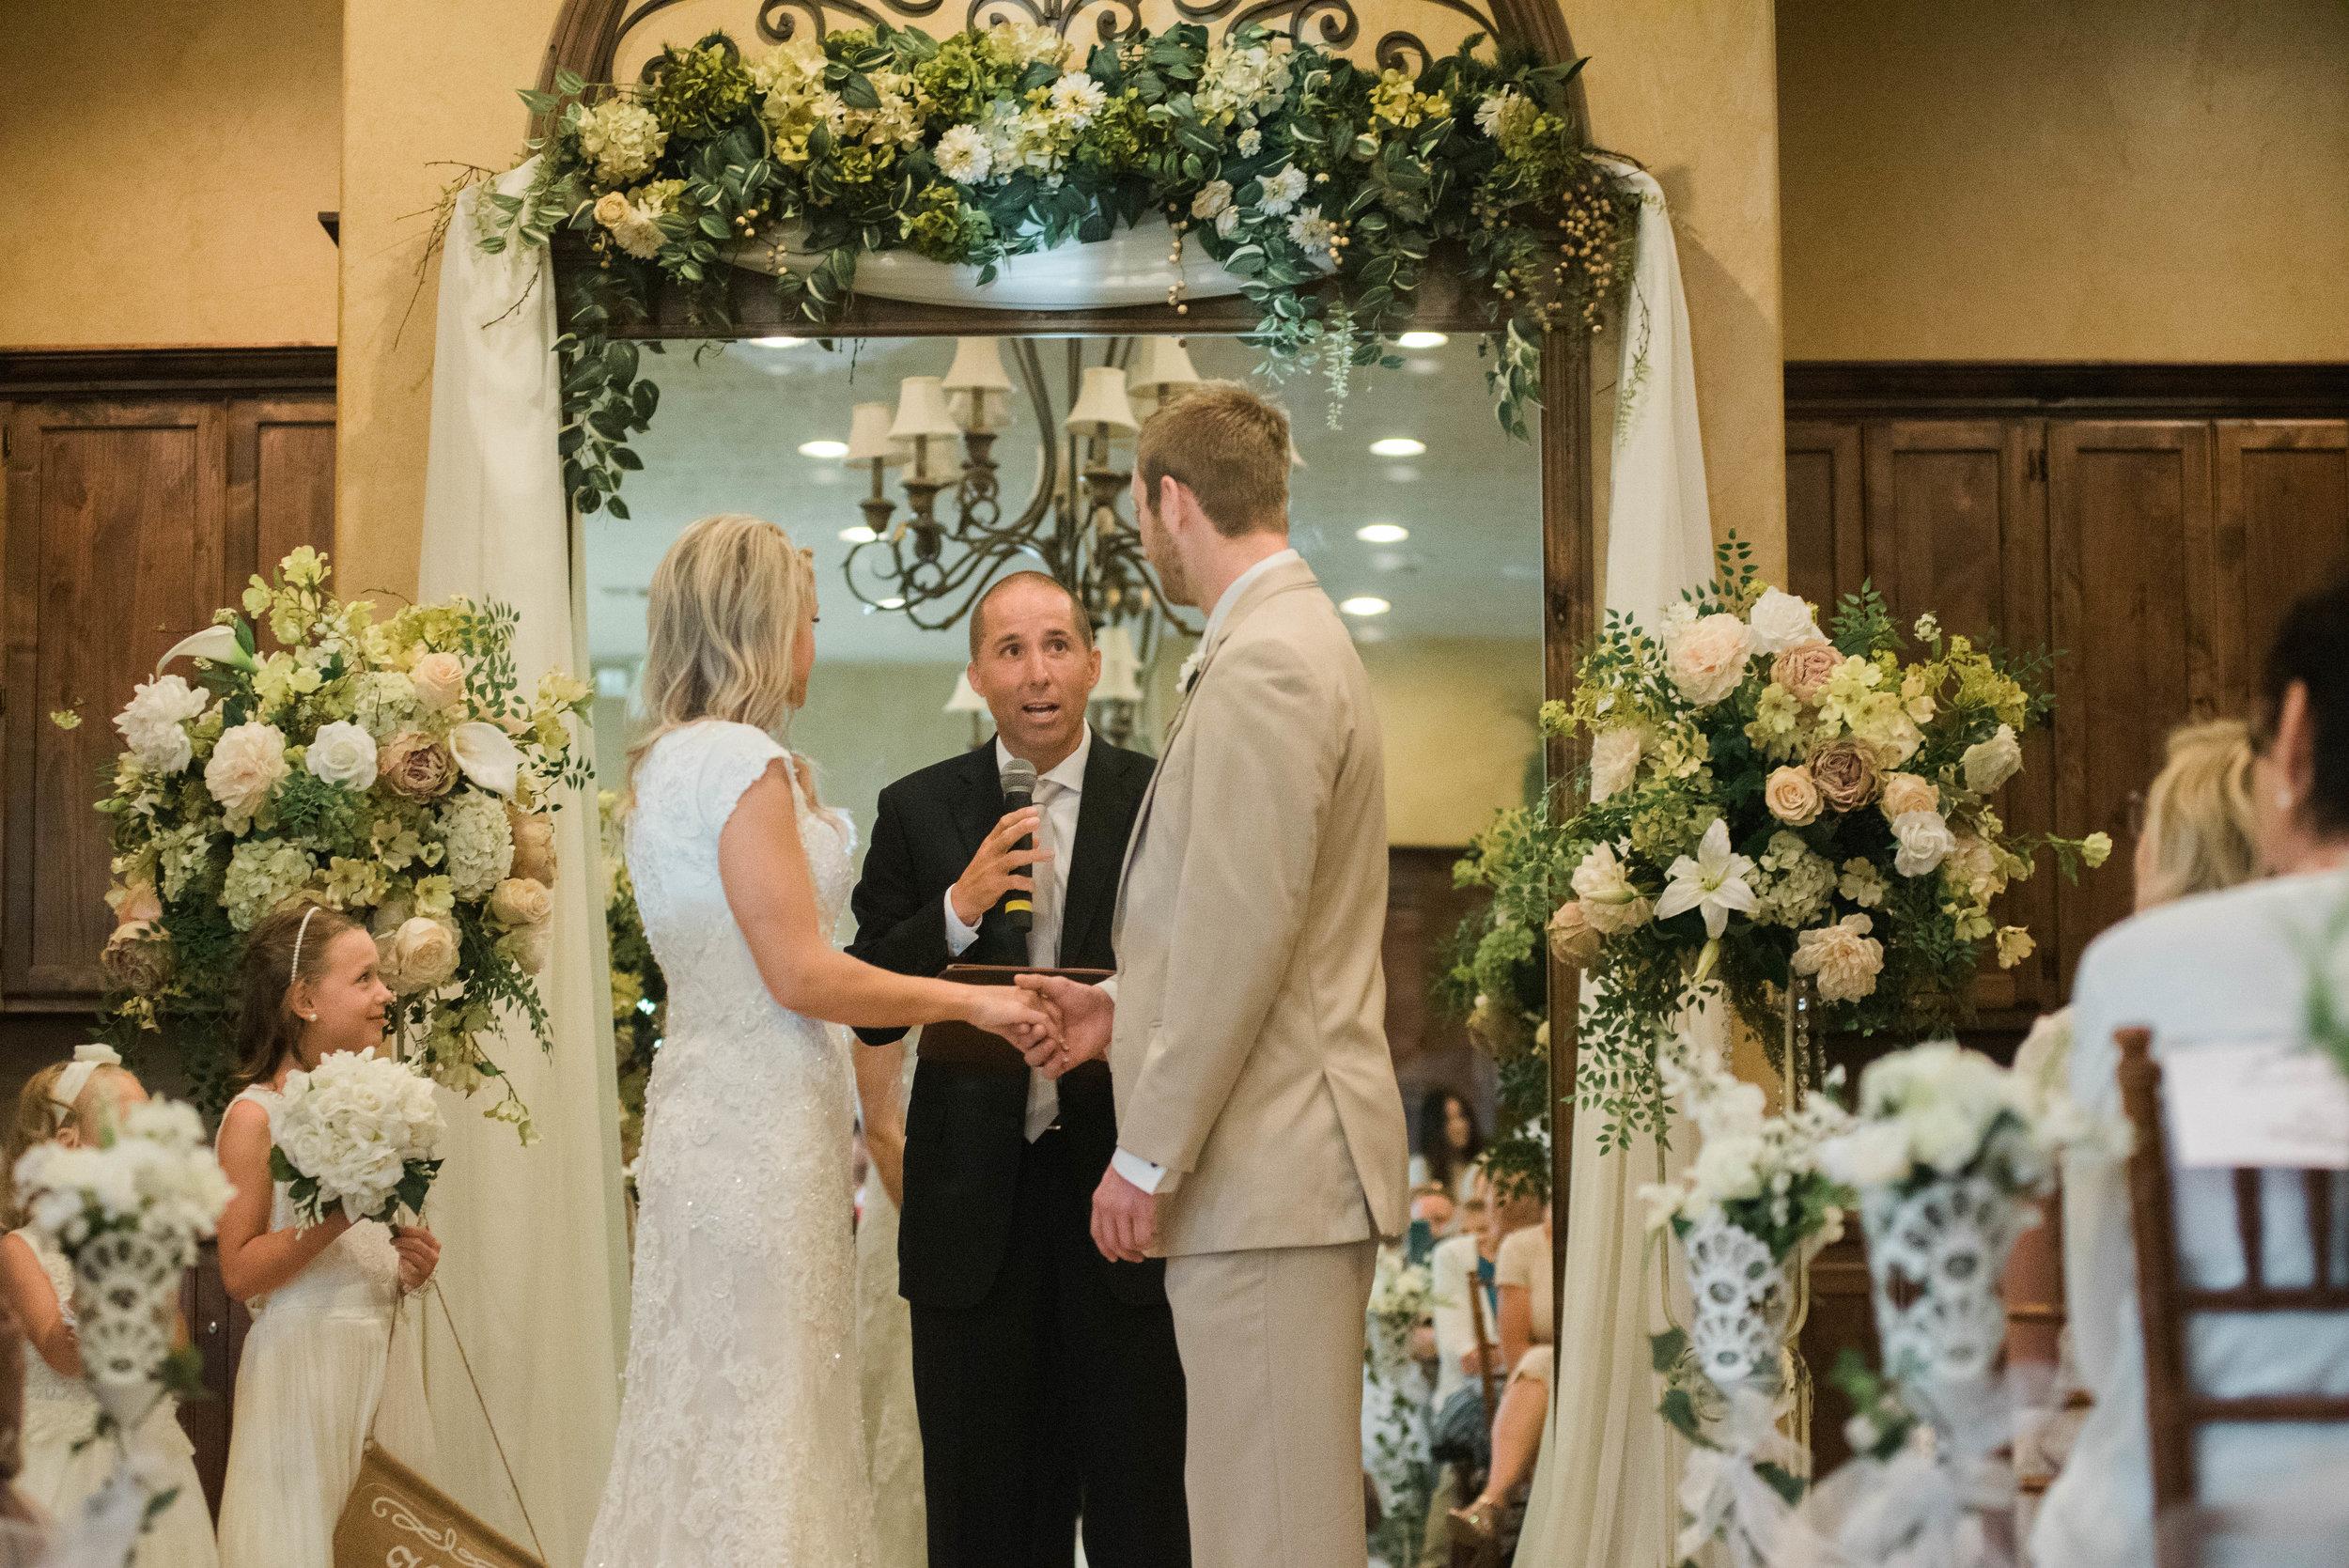 DANIEL+LACI-WEDDING-Sadie_Banks_Photography-216.jpg